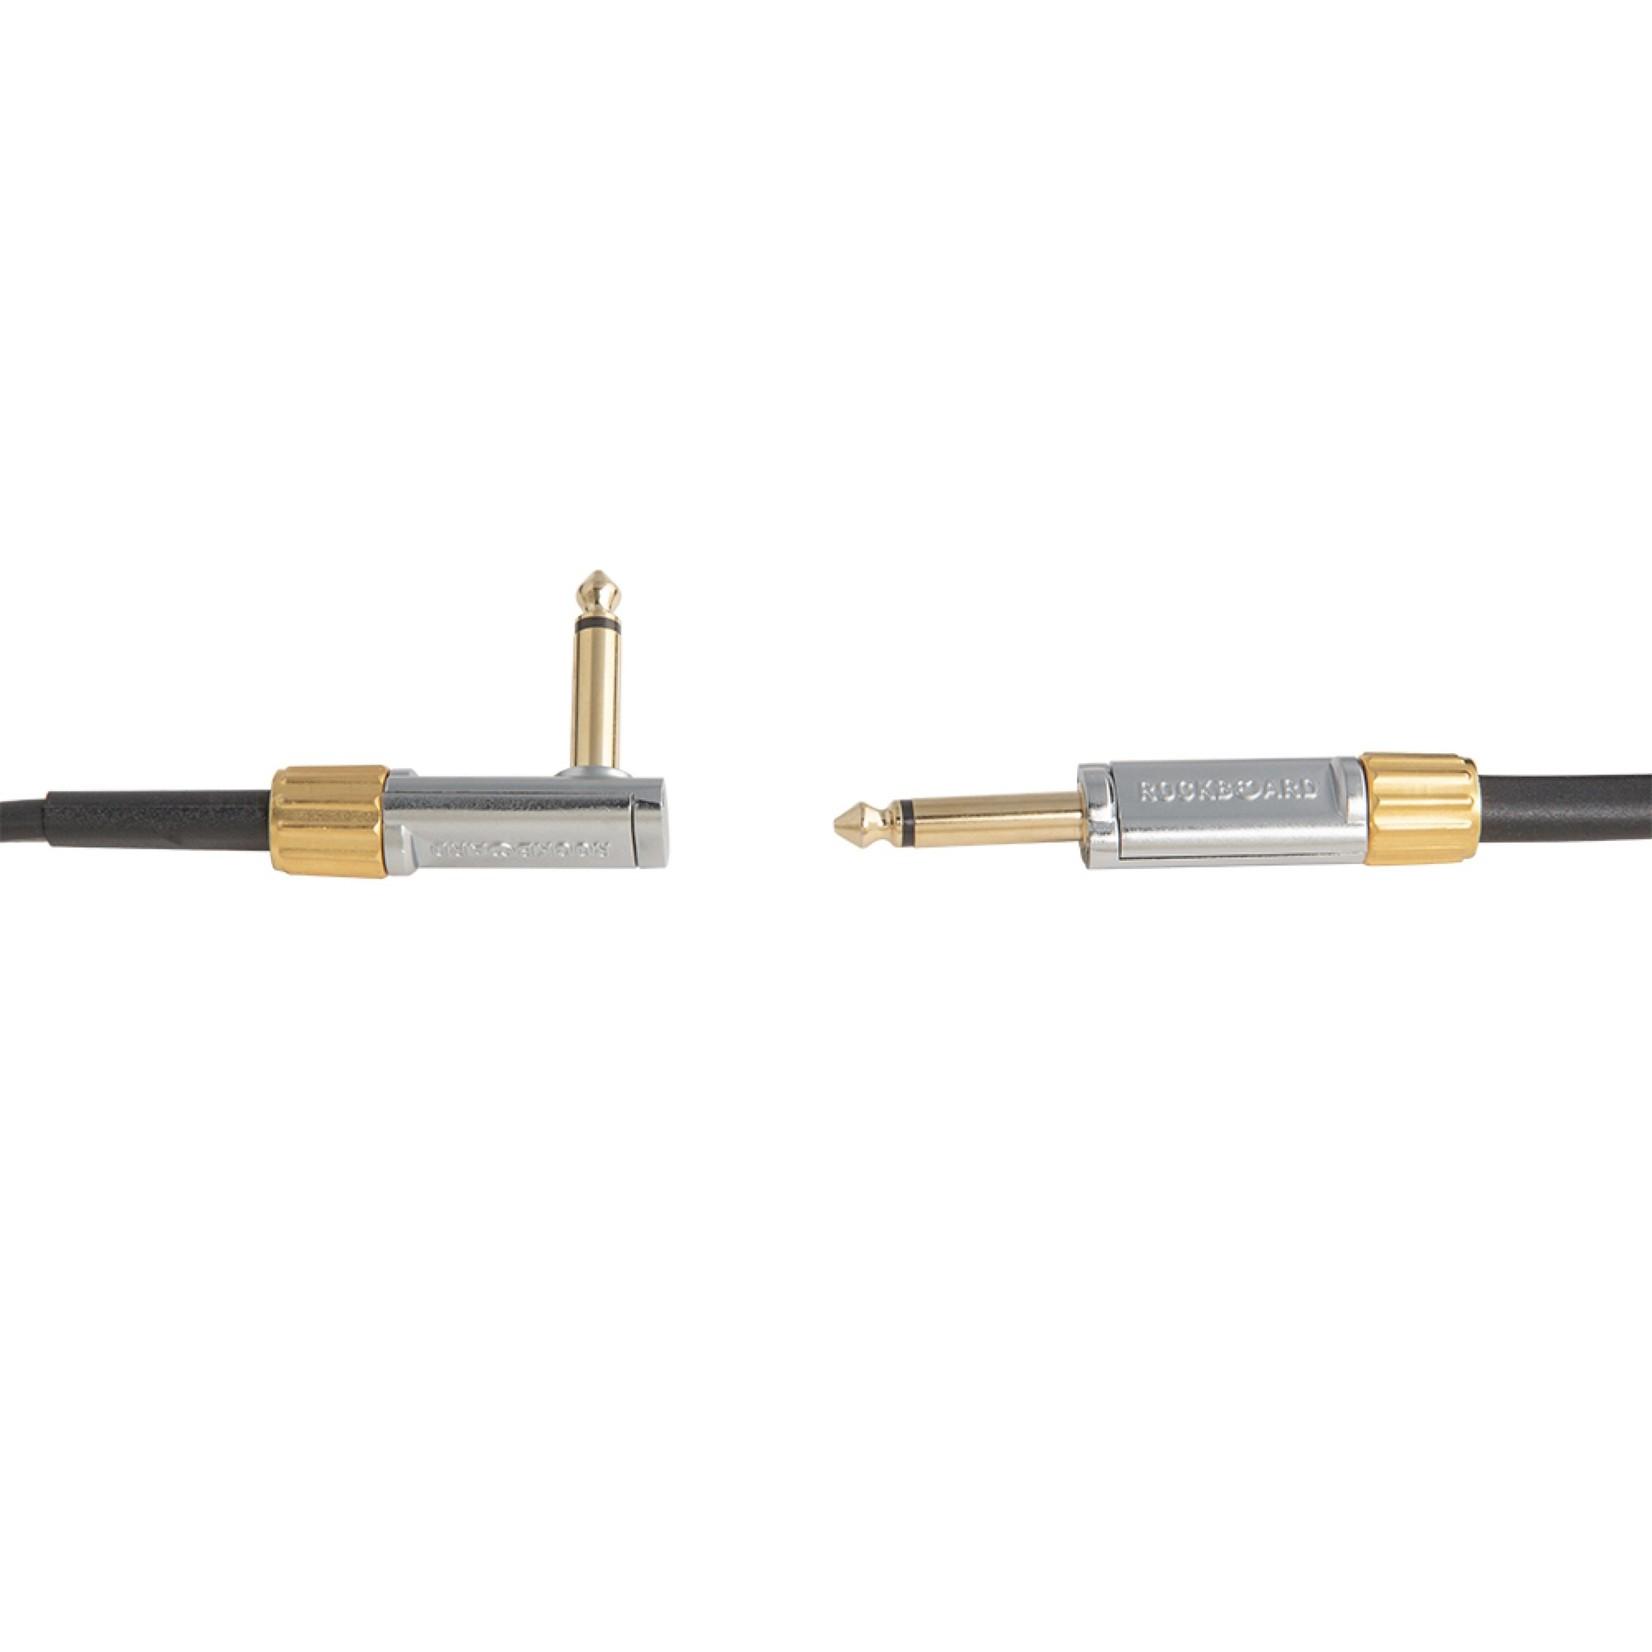 Rockboard RockBoard PREMIUM Flat Instrument Cable, 300 cm / 9.8 ft., straight/angled